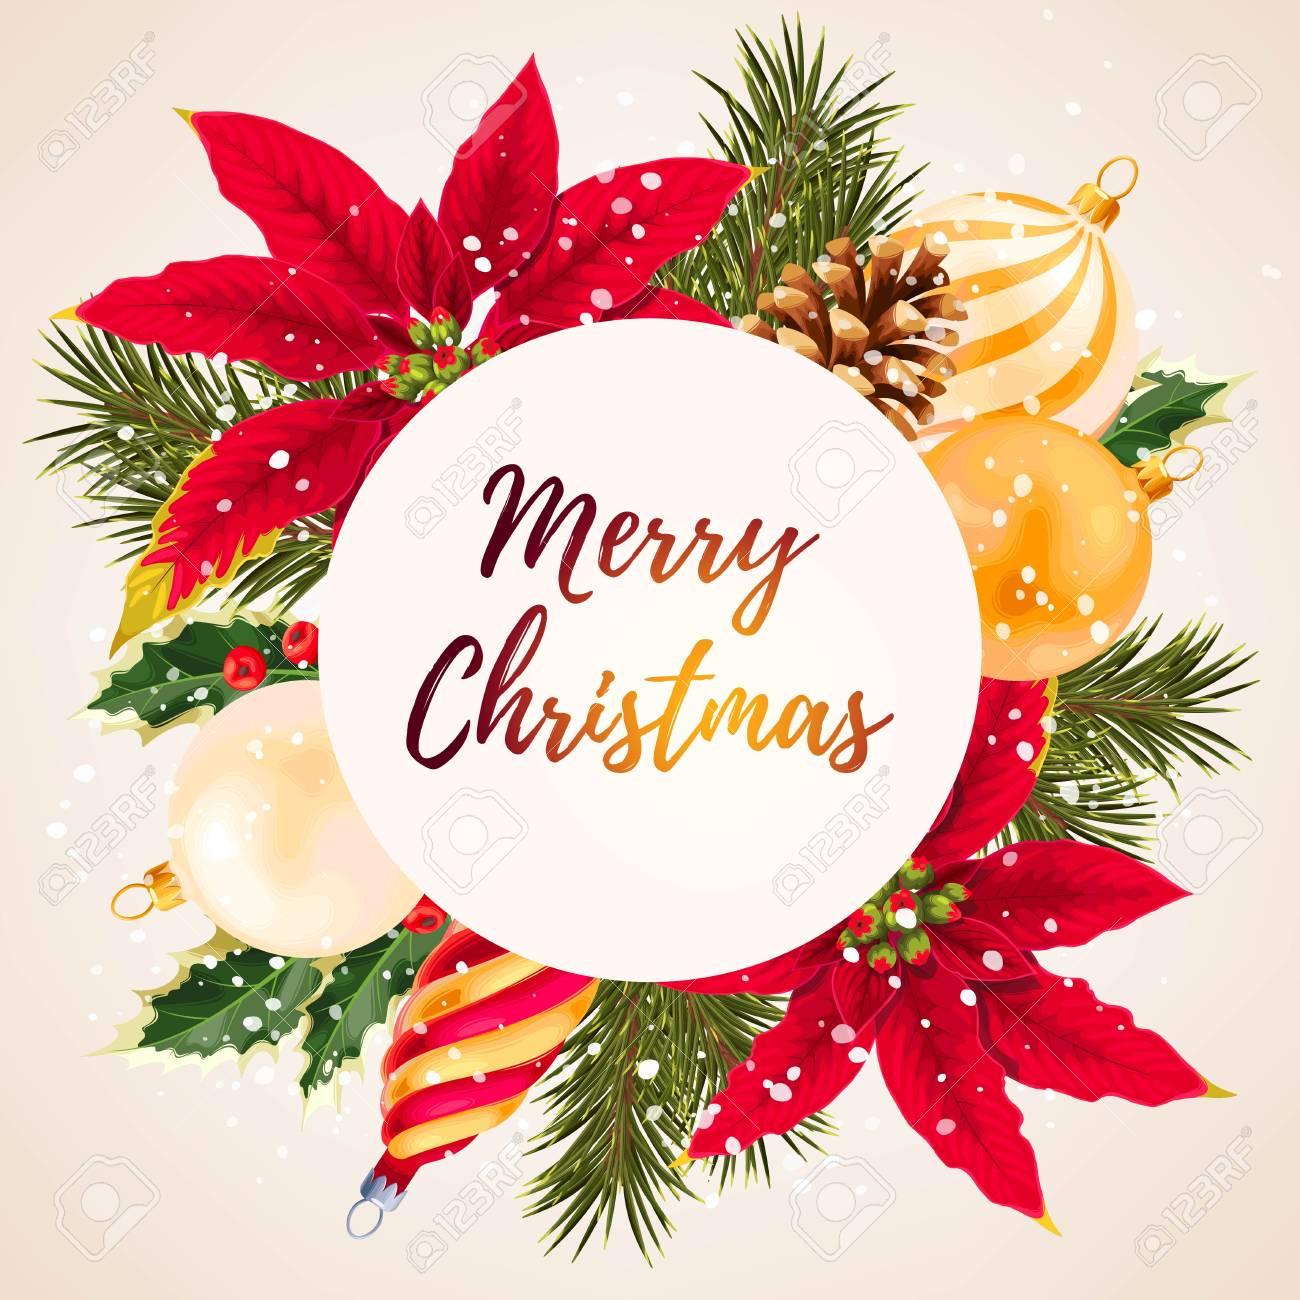 Christmas Greeting Pic Gallery Greetings Card Design Simple